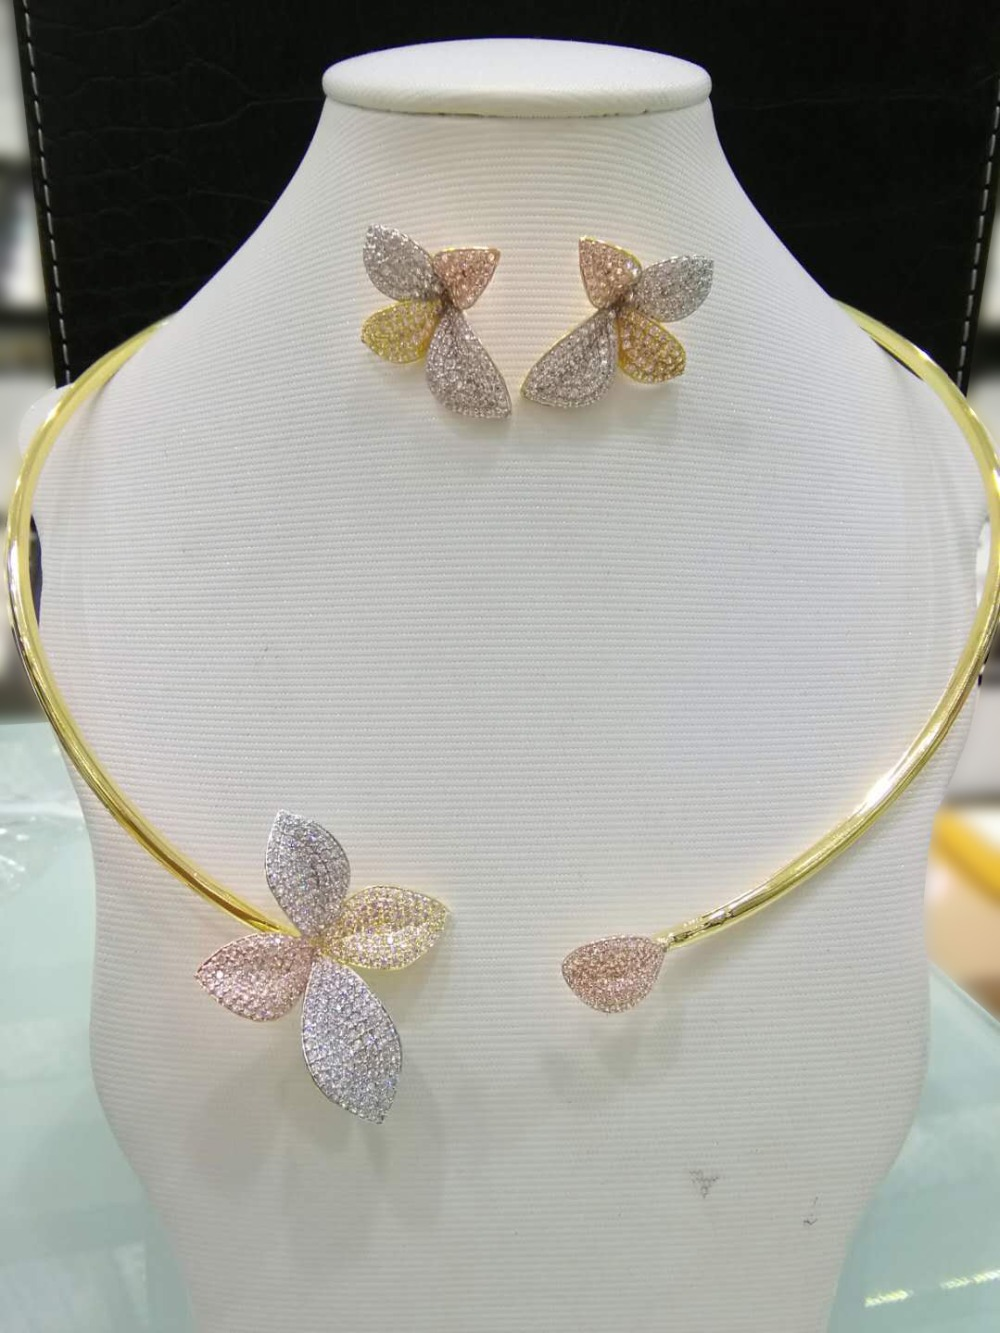 GODKI Big Super Luxury Floral Flower Women Wedding Cubic Zirconia Choker Necklace Earring Dubai Jewelry Set Jewellery Addict rhinestoned floral wide choker